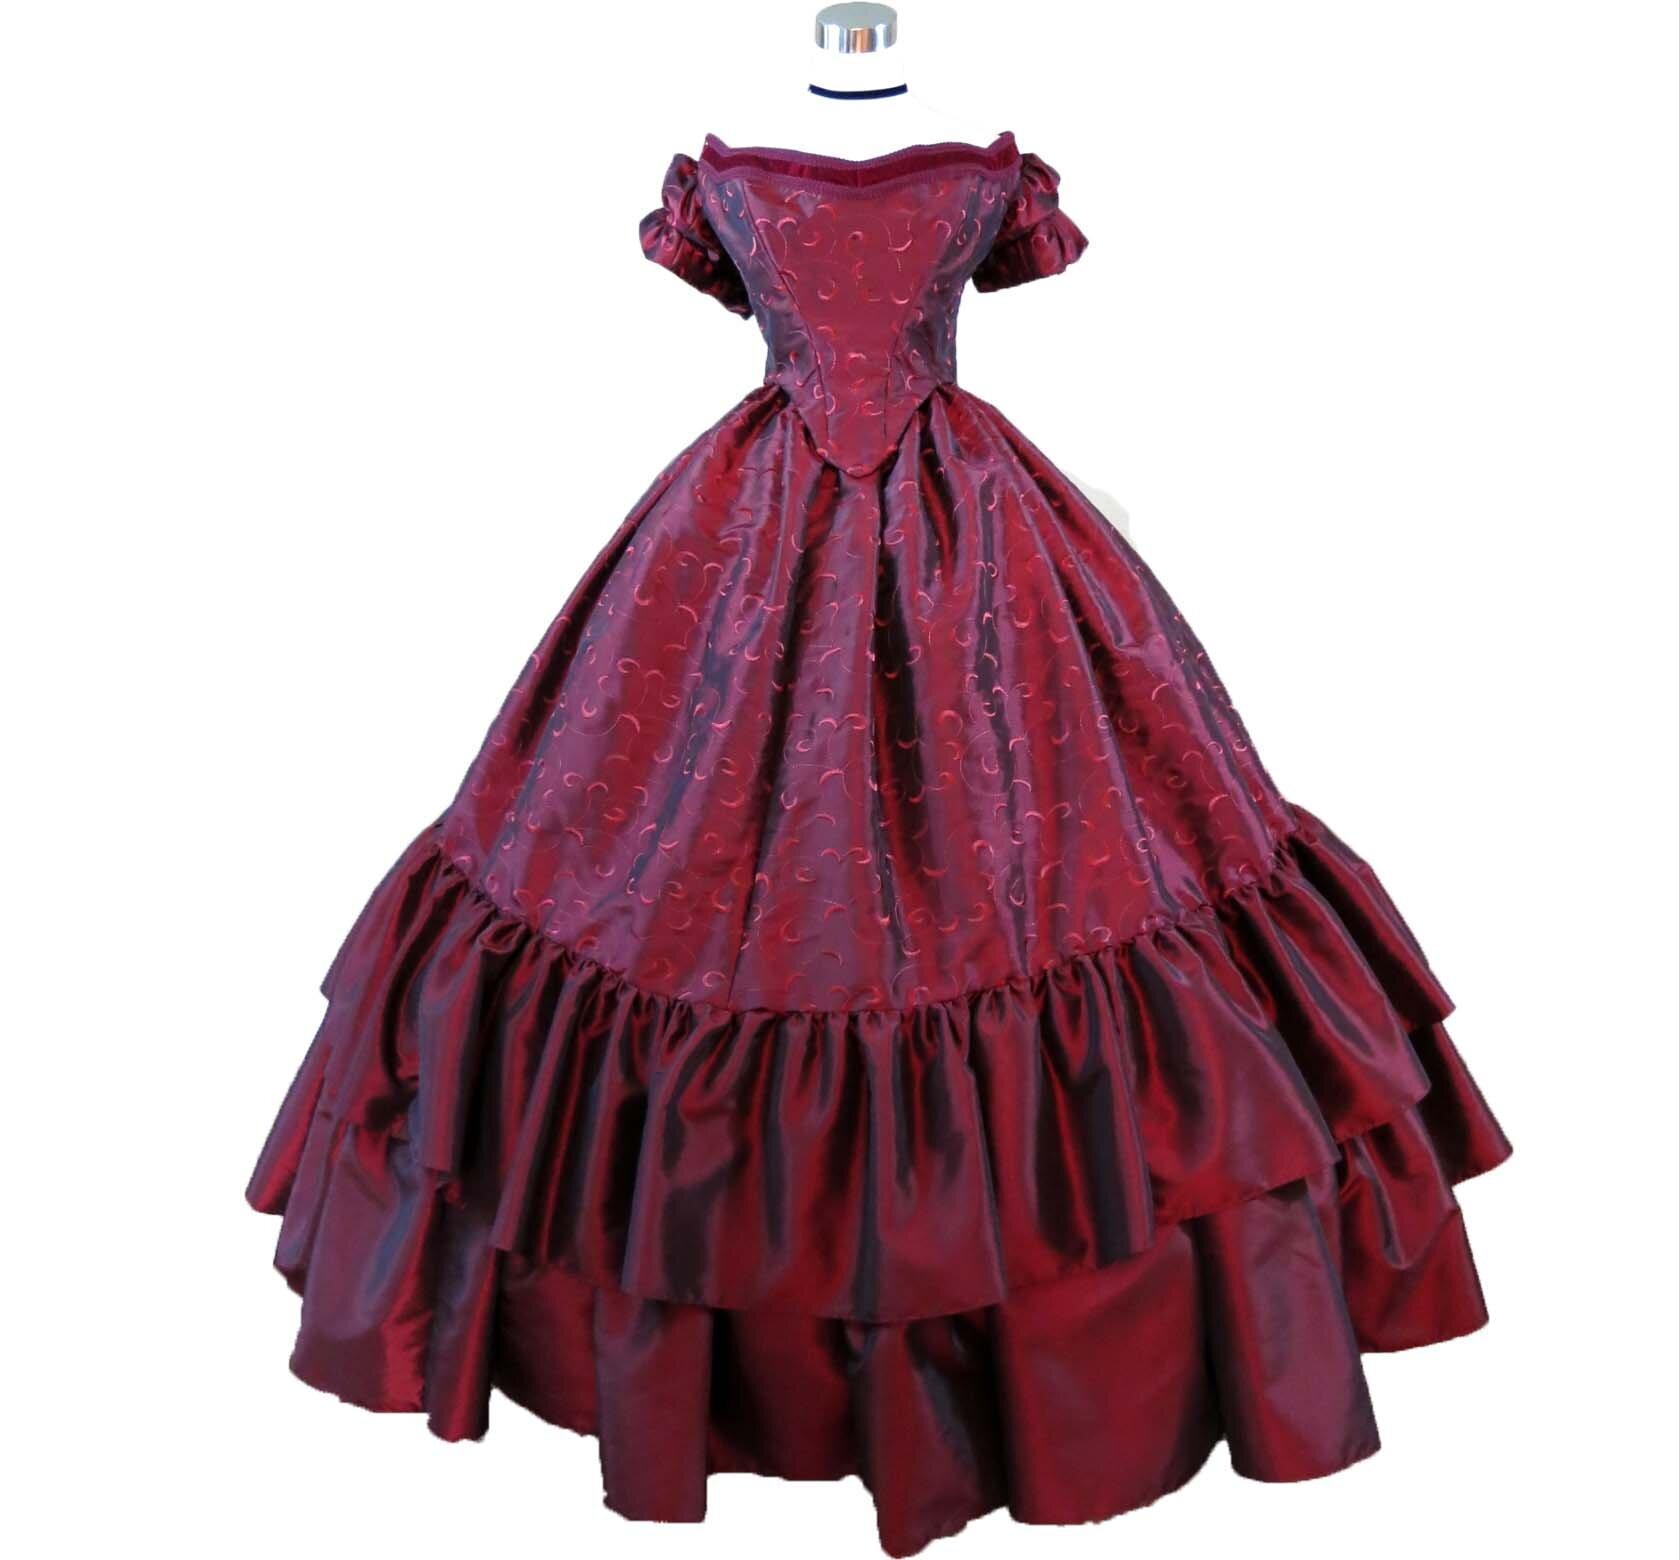 Red Taffeta Ensemble Waist 32 34 Civil War Ball Gowns Costume